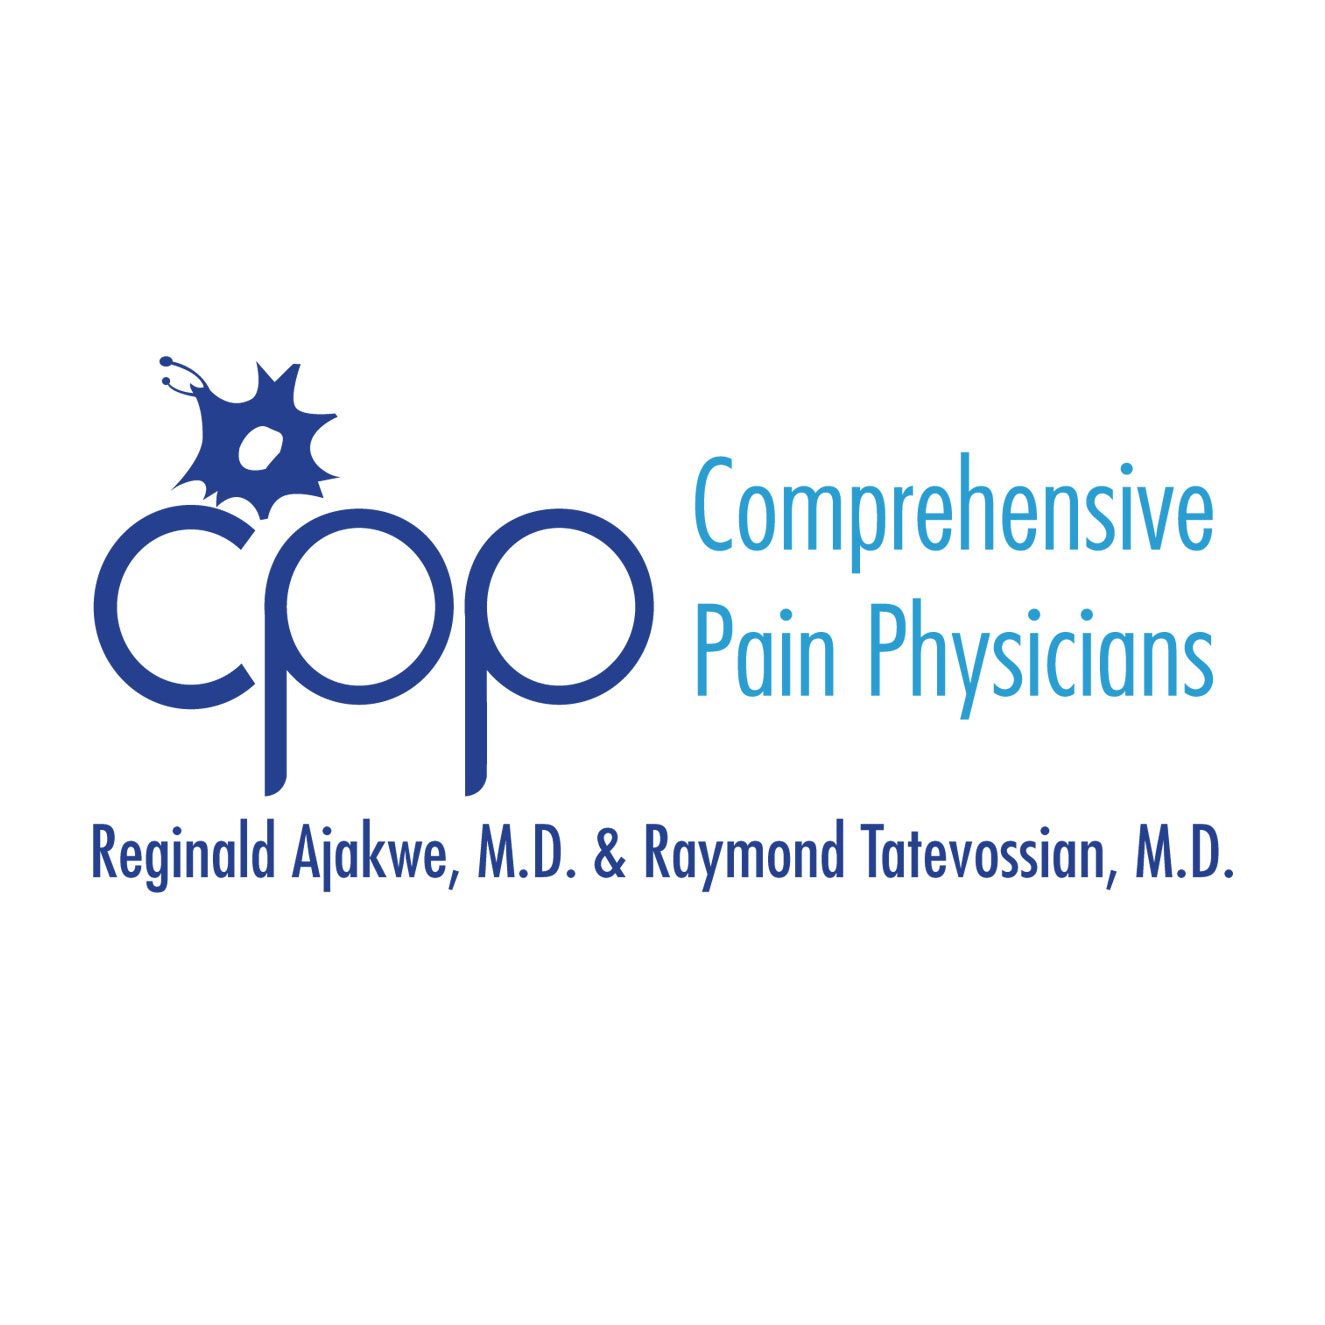 Comprehensive Pain Physicians